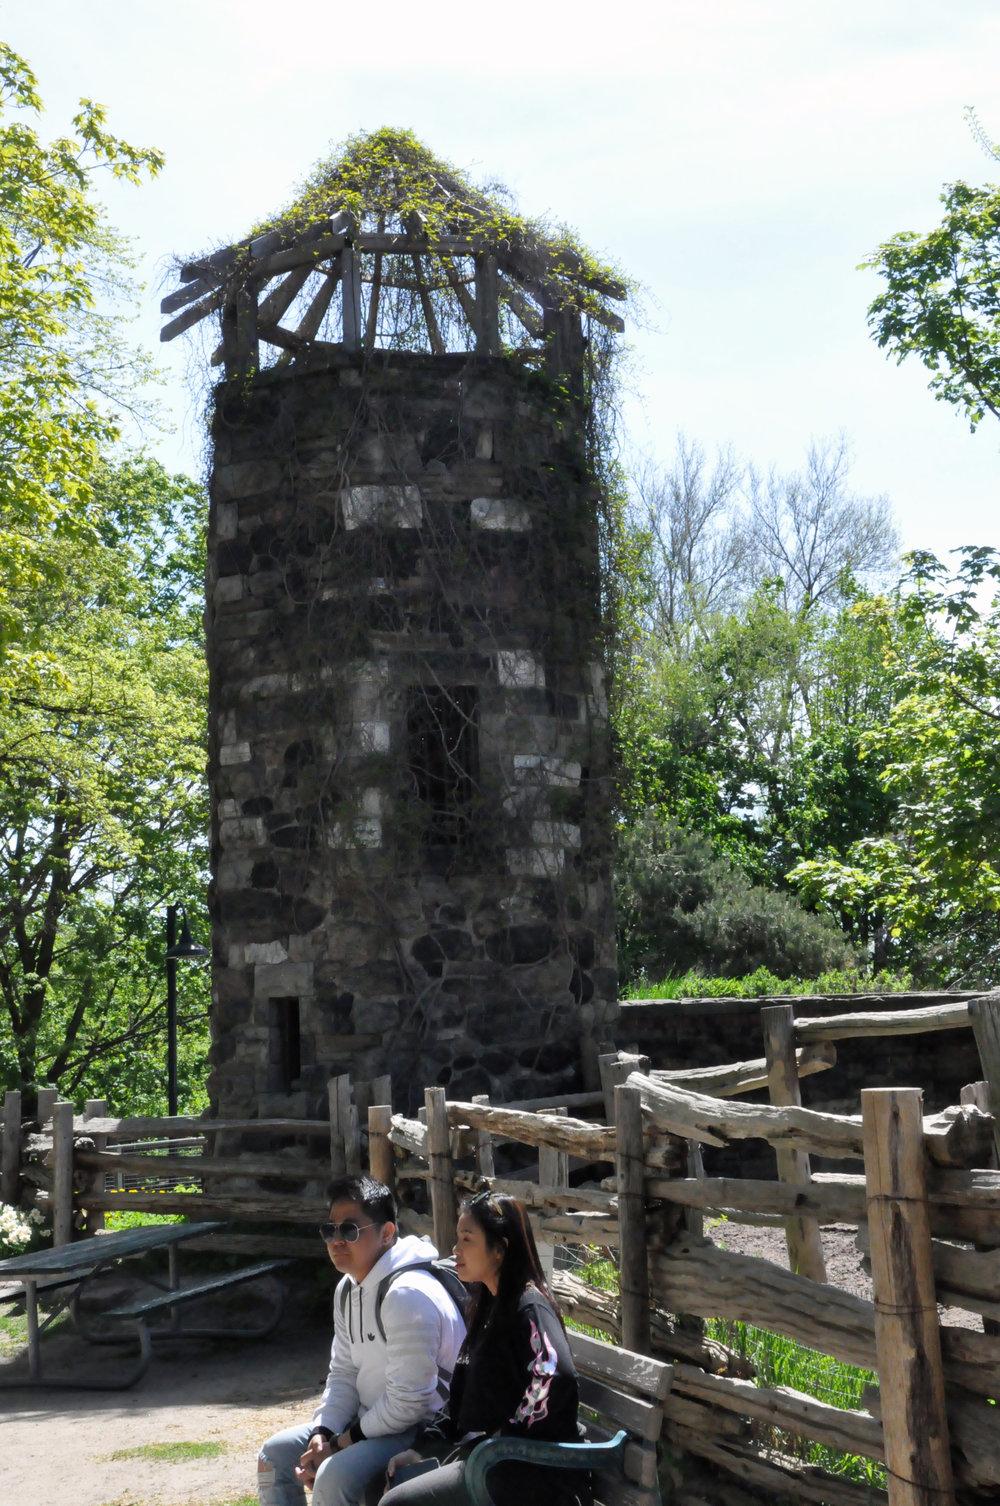 180518a61.jpg